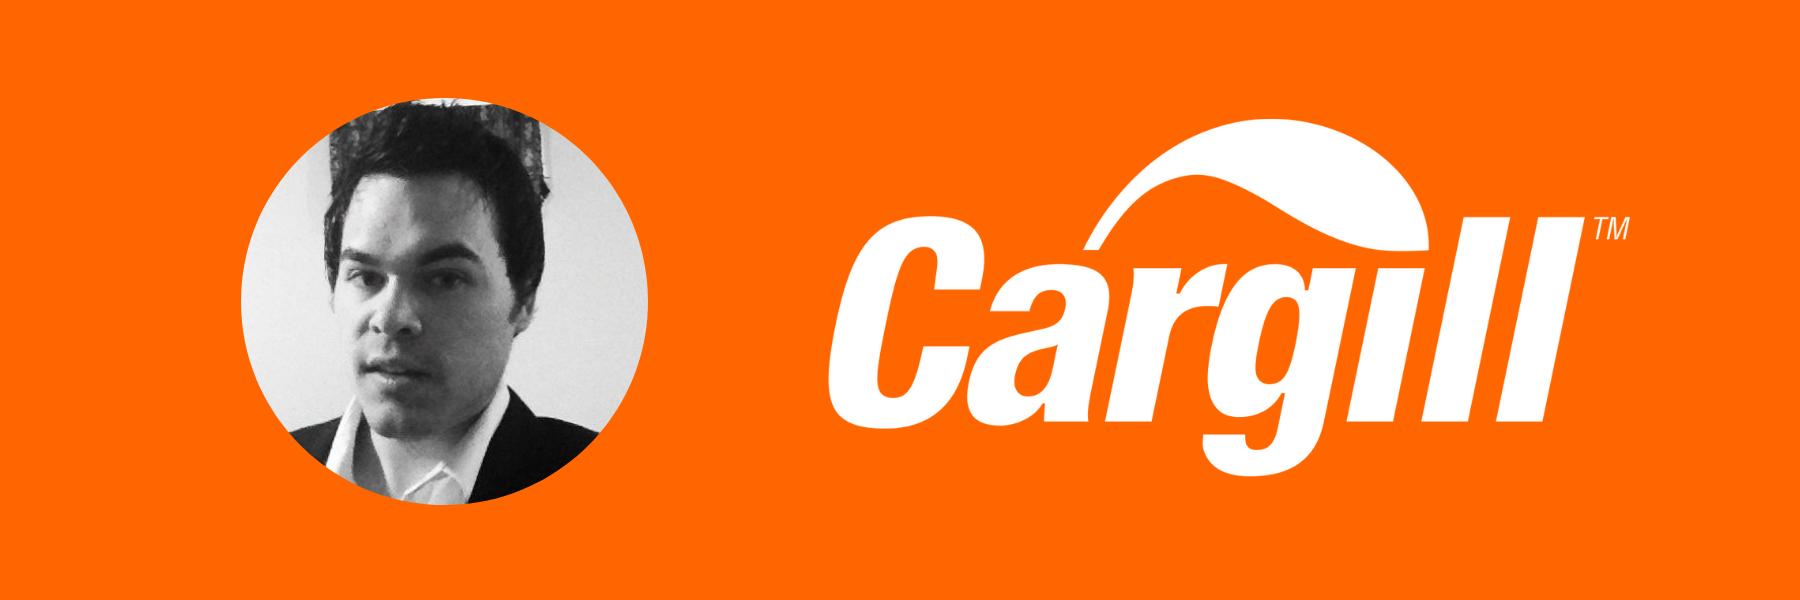 cargill- avs.png